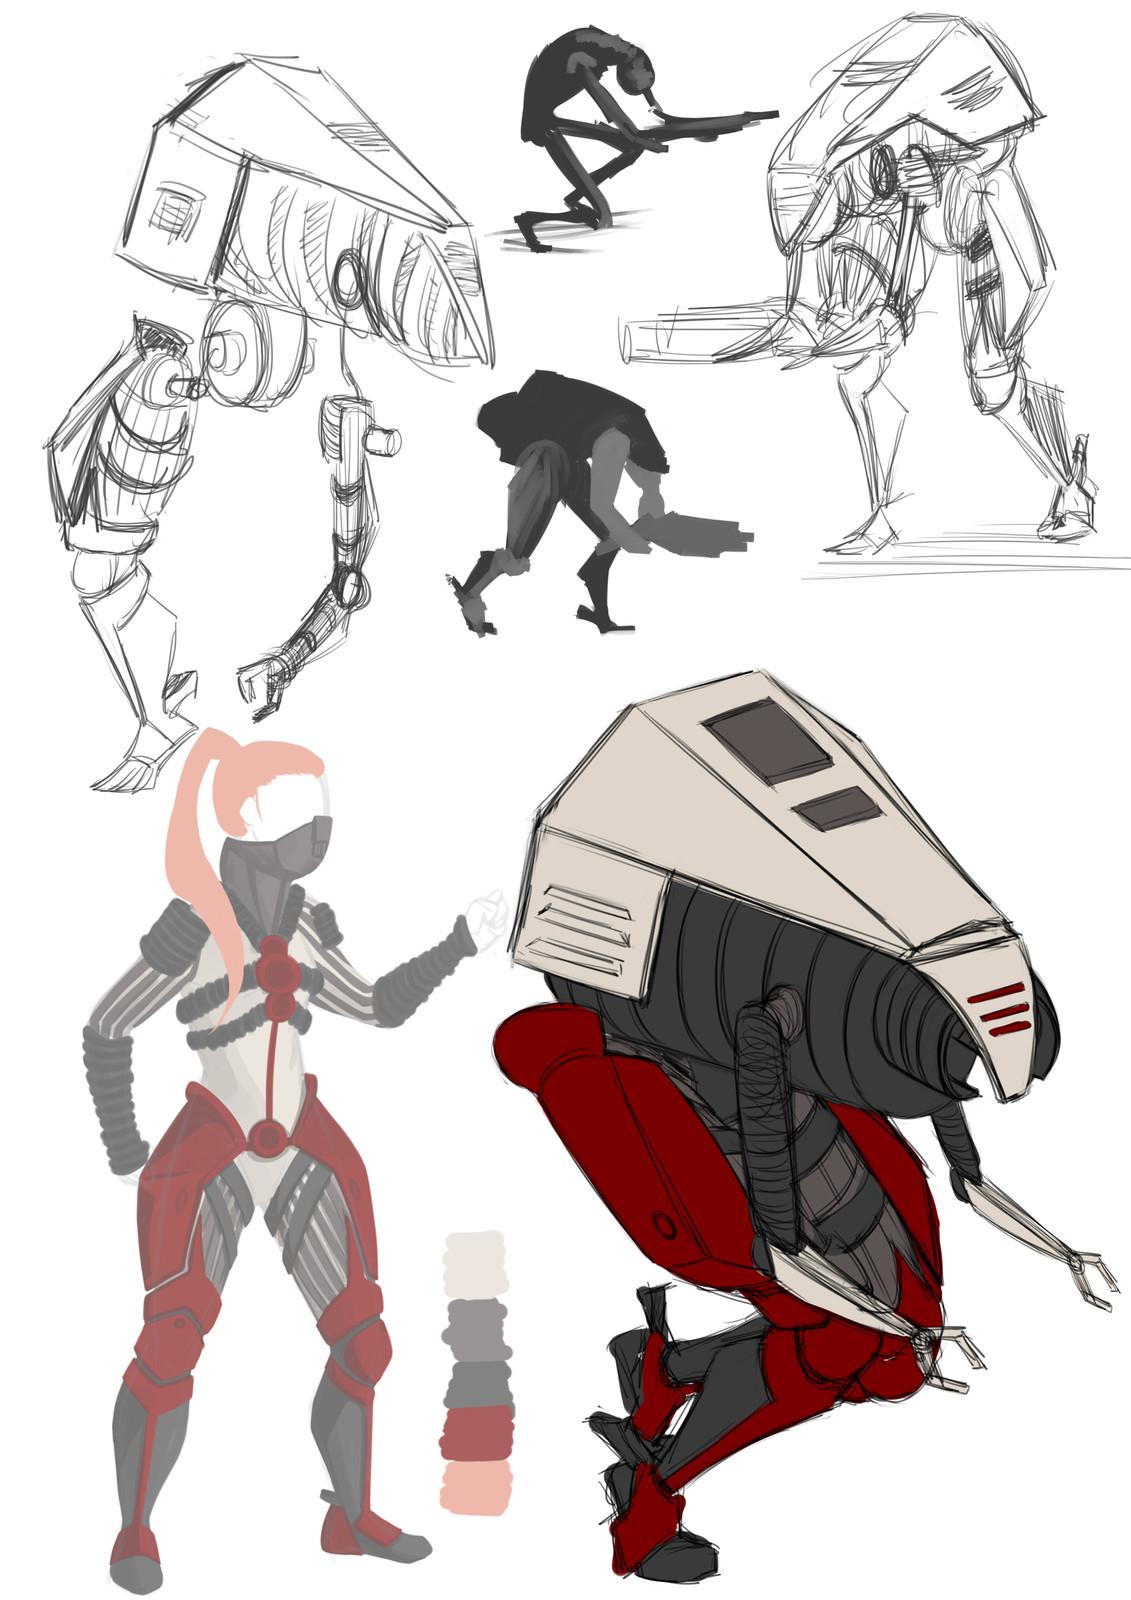 Mech concept sketches